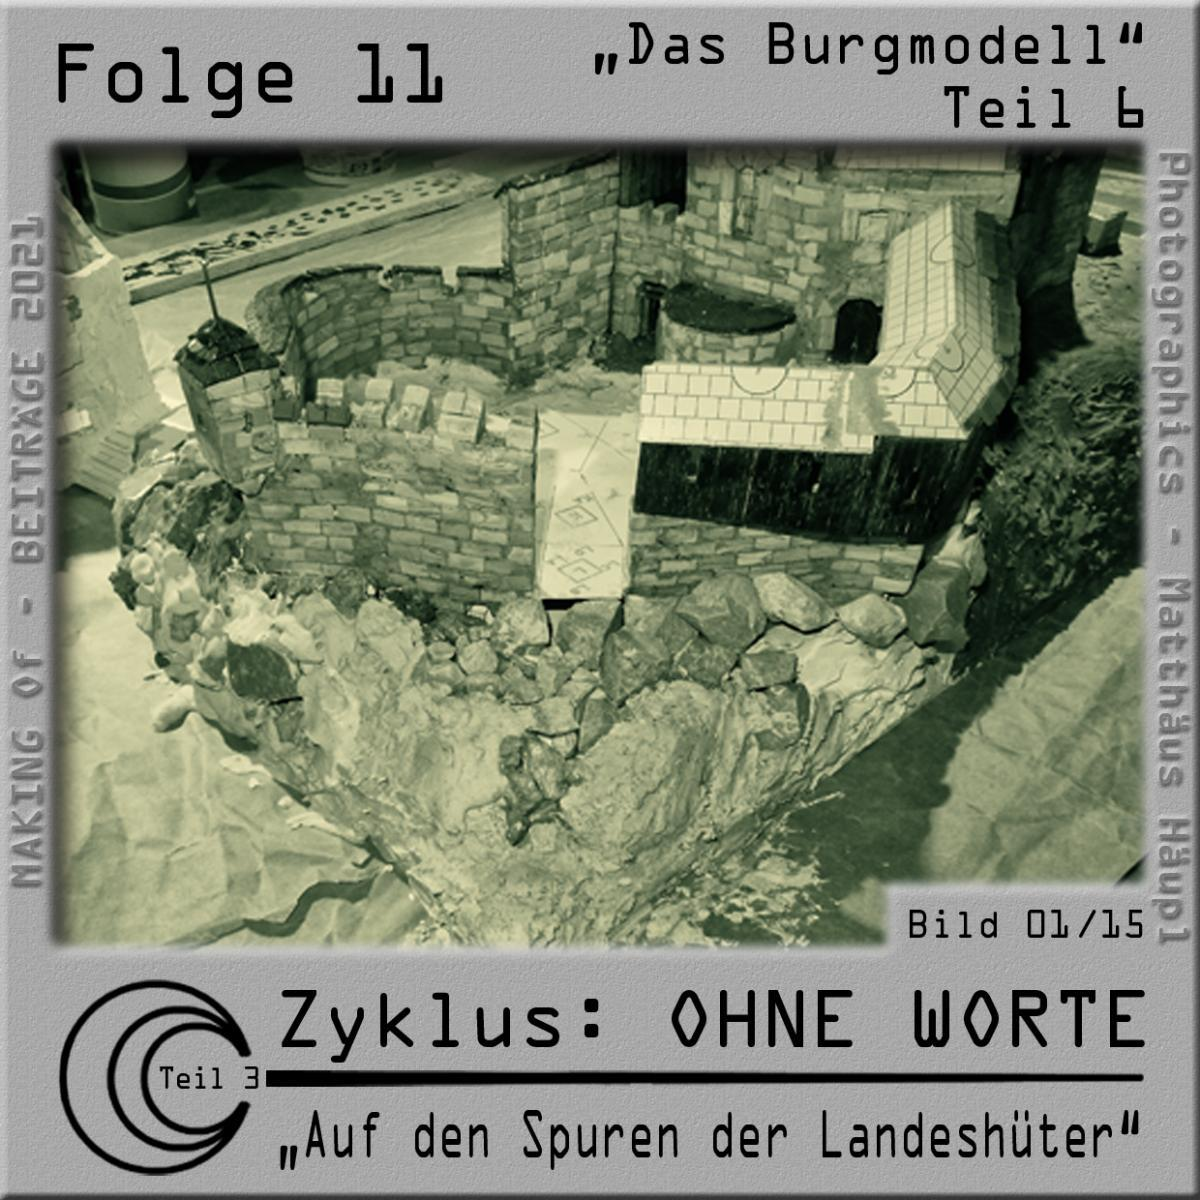 Folge-11 Das-Burgmodell Teil-6-01